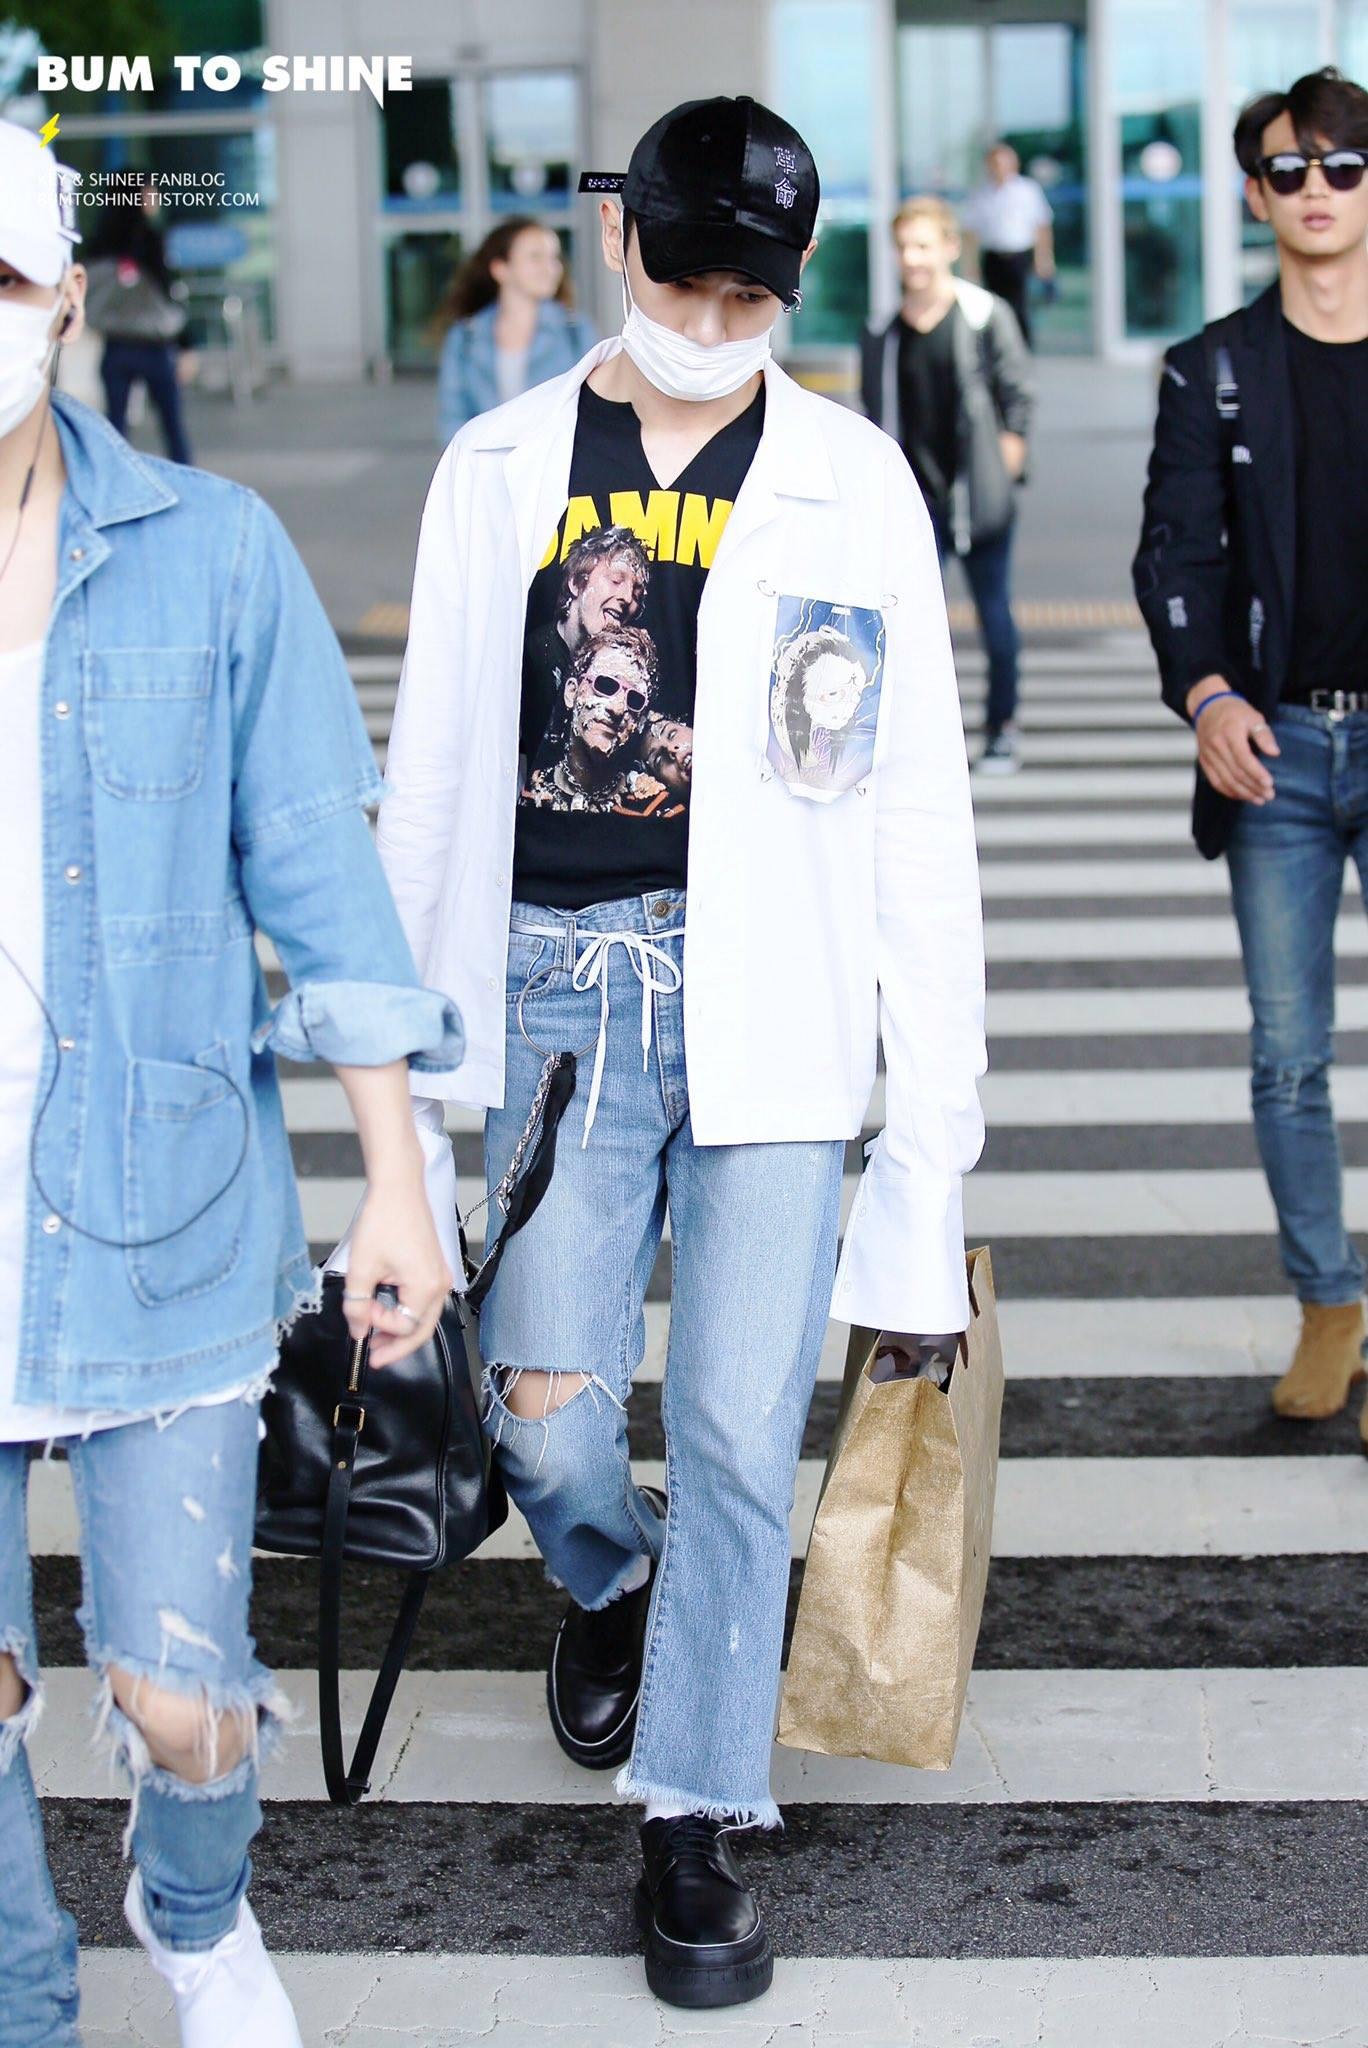 [IMG/160718] Onew, Jonghyun, Key, Minho @Aeropuerto de Kansai e Incheon (Jap-Cor) 76aqvHI7